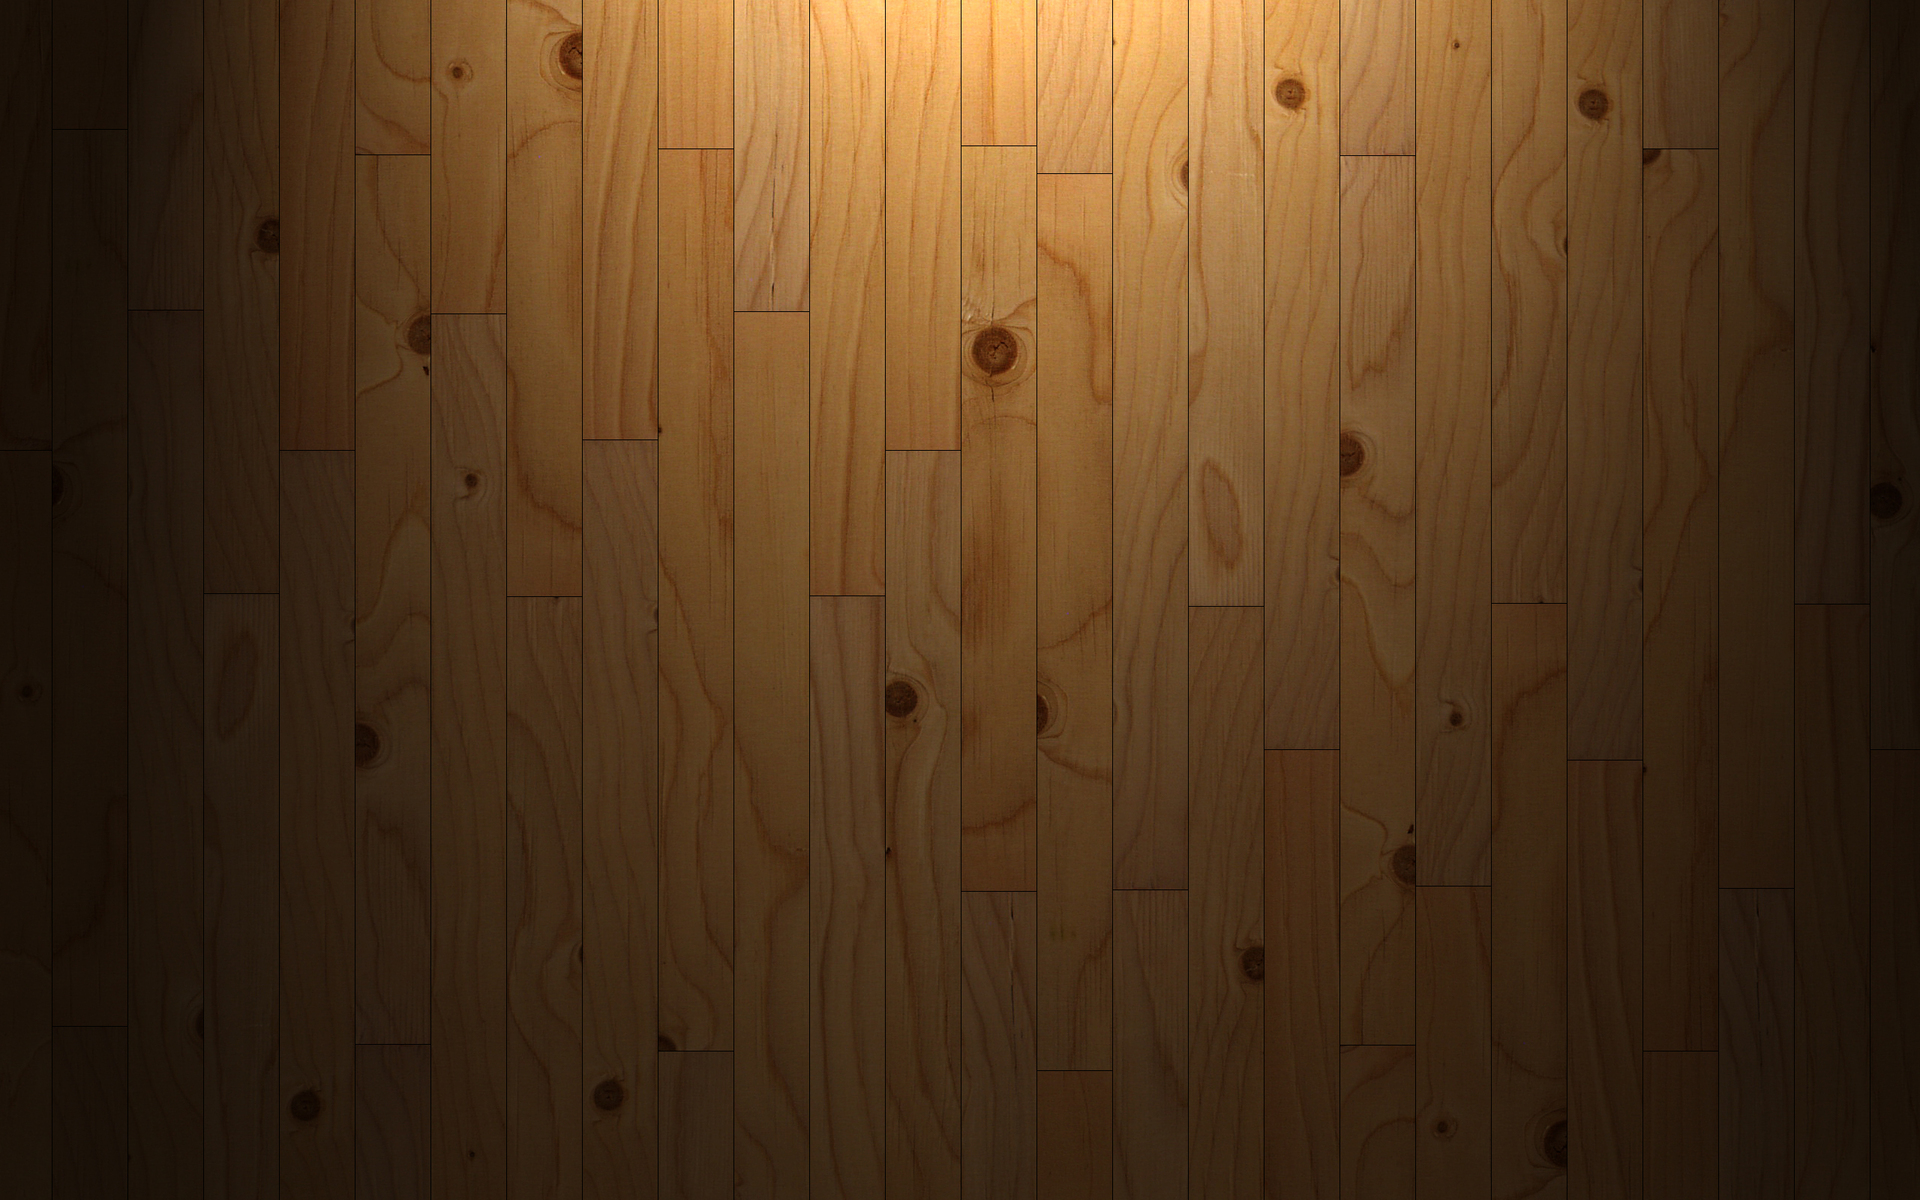 dimmick memorial library dark wooden website background jpg